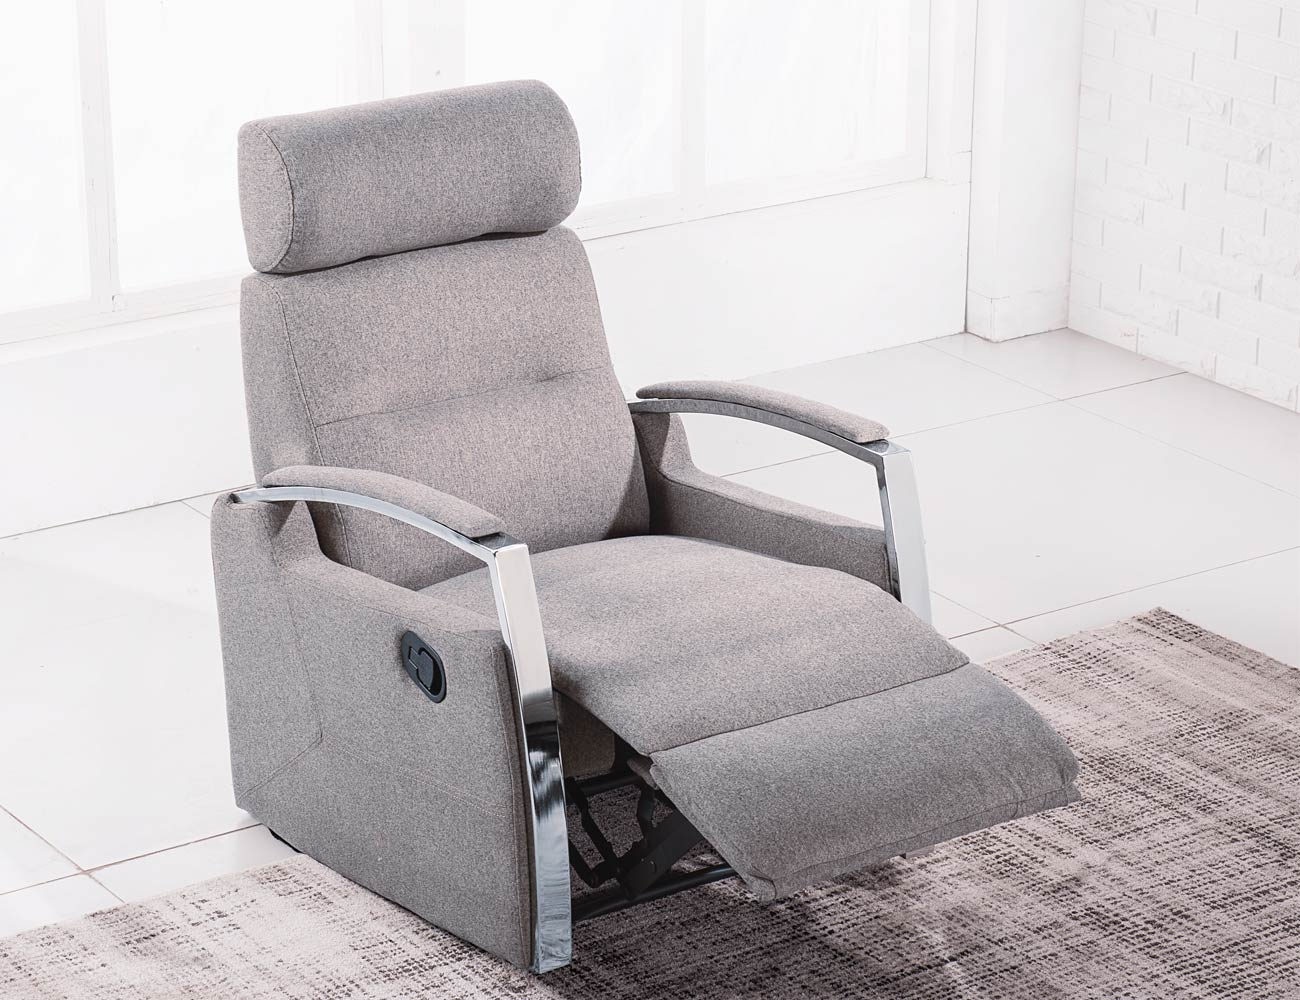 Mueble gris marengo 20170906150649 - Factory del mueble ...